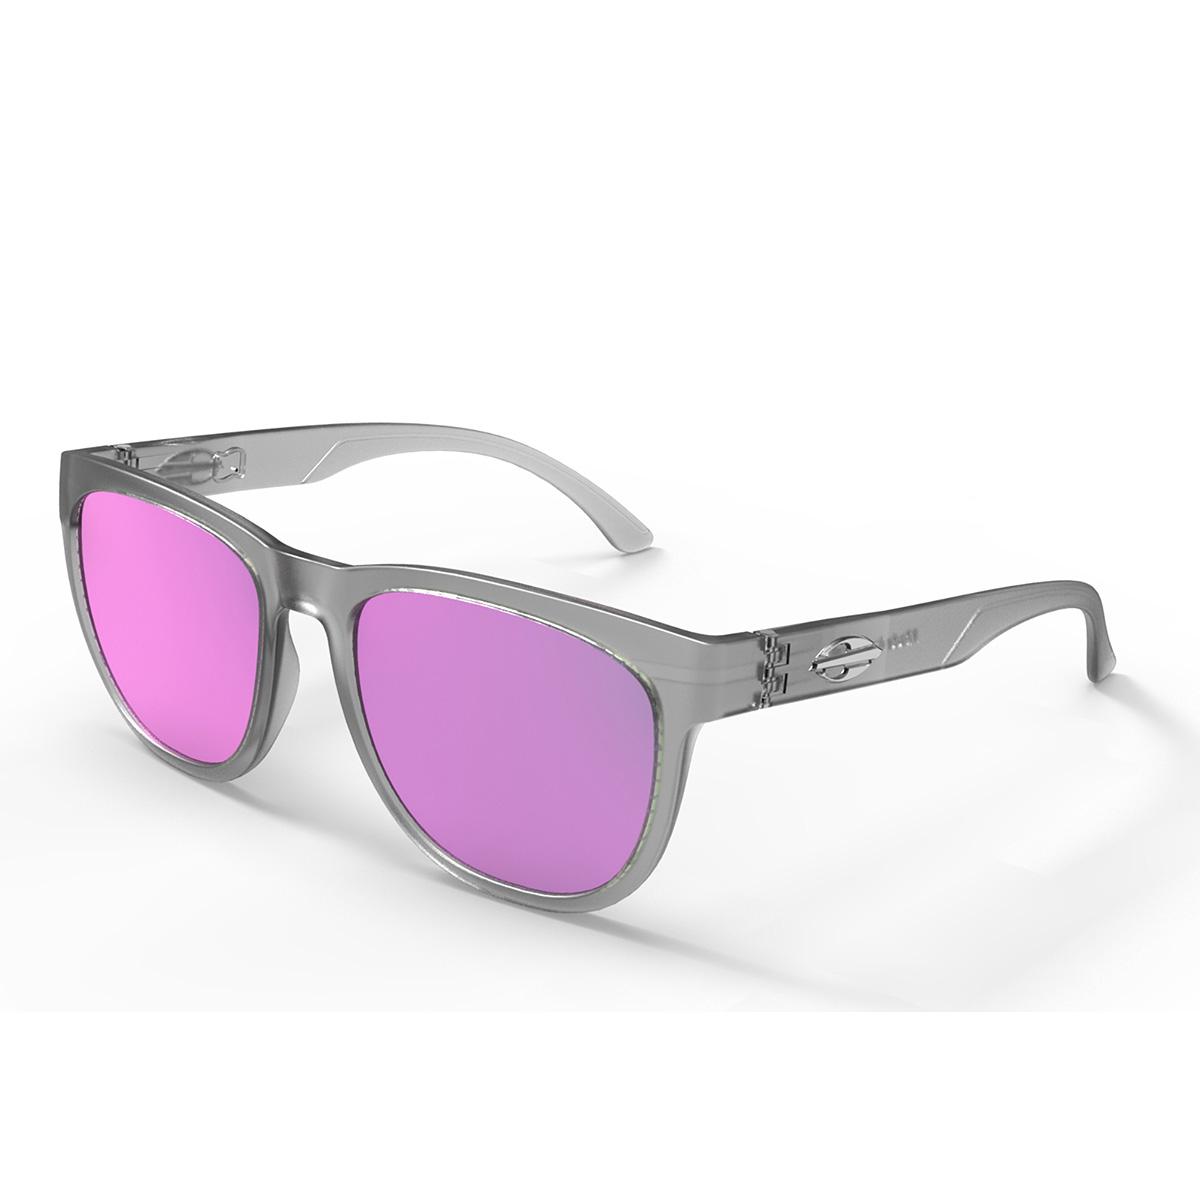 Óculos de Sol Mormaii Santa Cruz M0030D2294MormaiiMormaii de ... 0bba4bc046